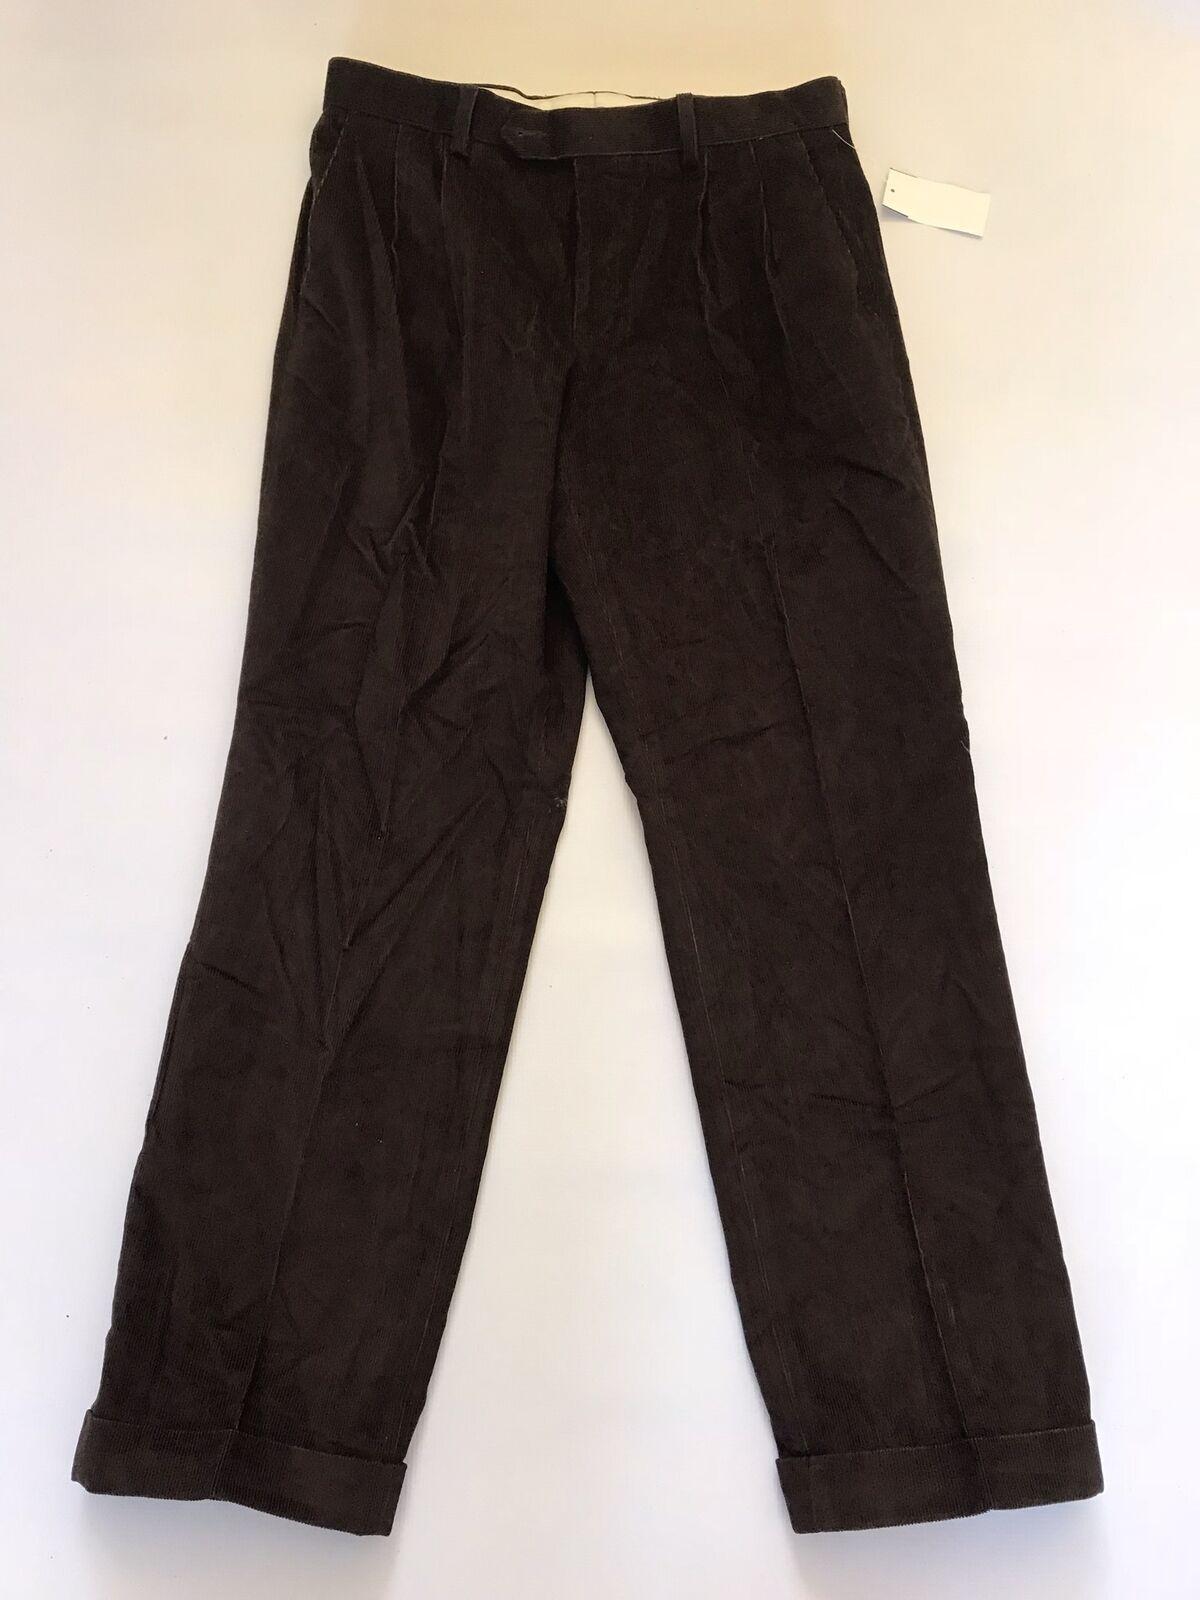 Lauren Ralph Lauren Pleated Corduroy Cuffed Dress Pants Brown Mens 34x32 New